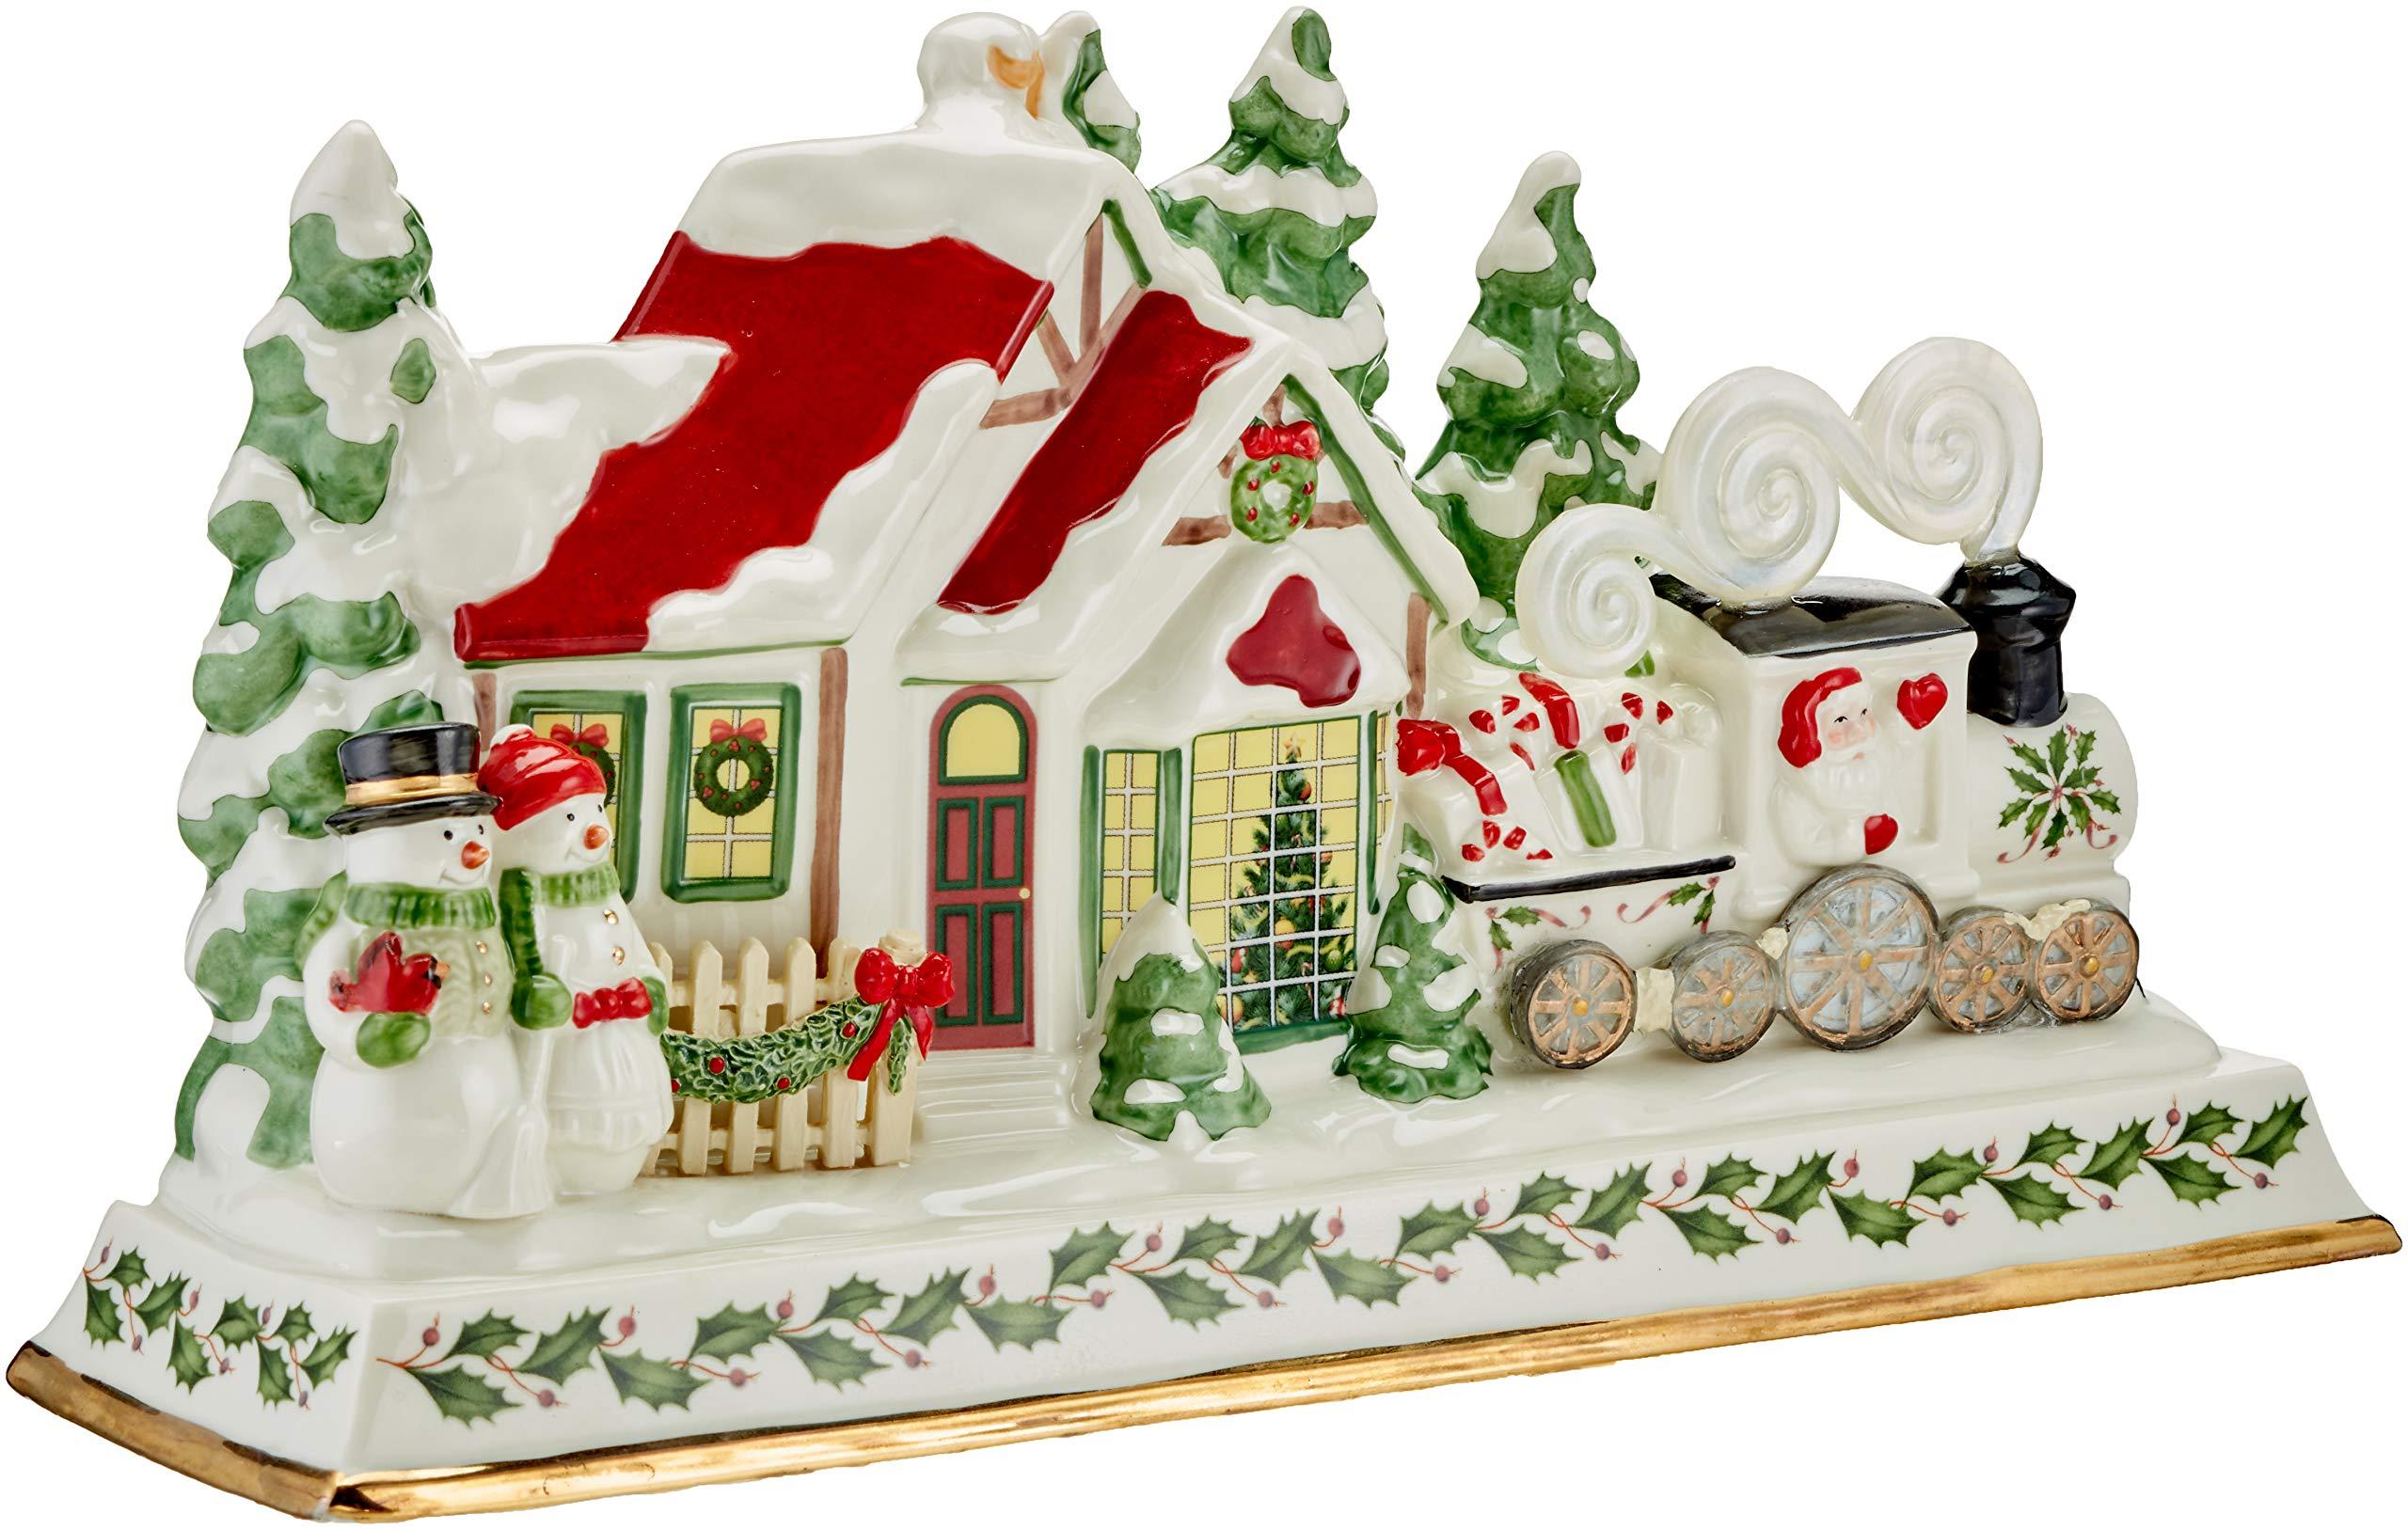 Lenox Holiday Musical Lighted Santa and Train